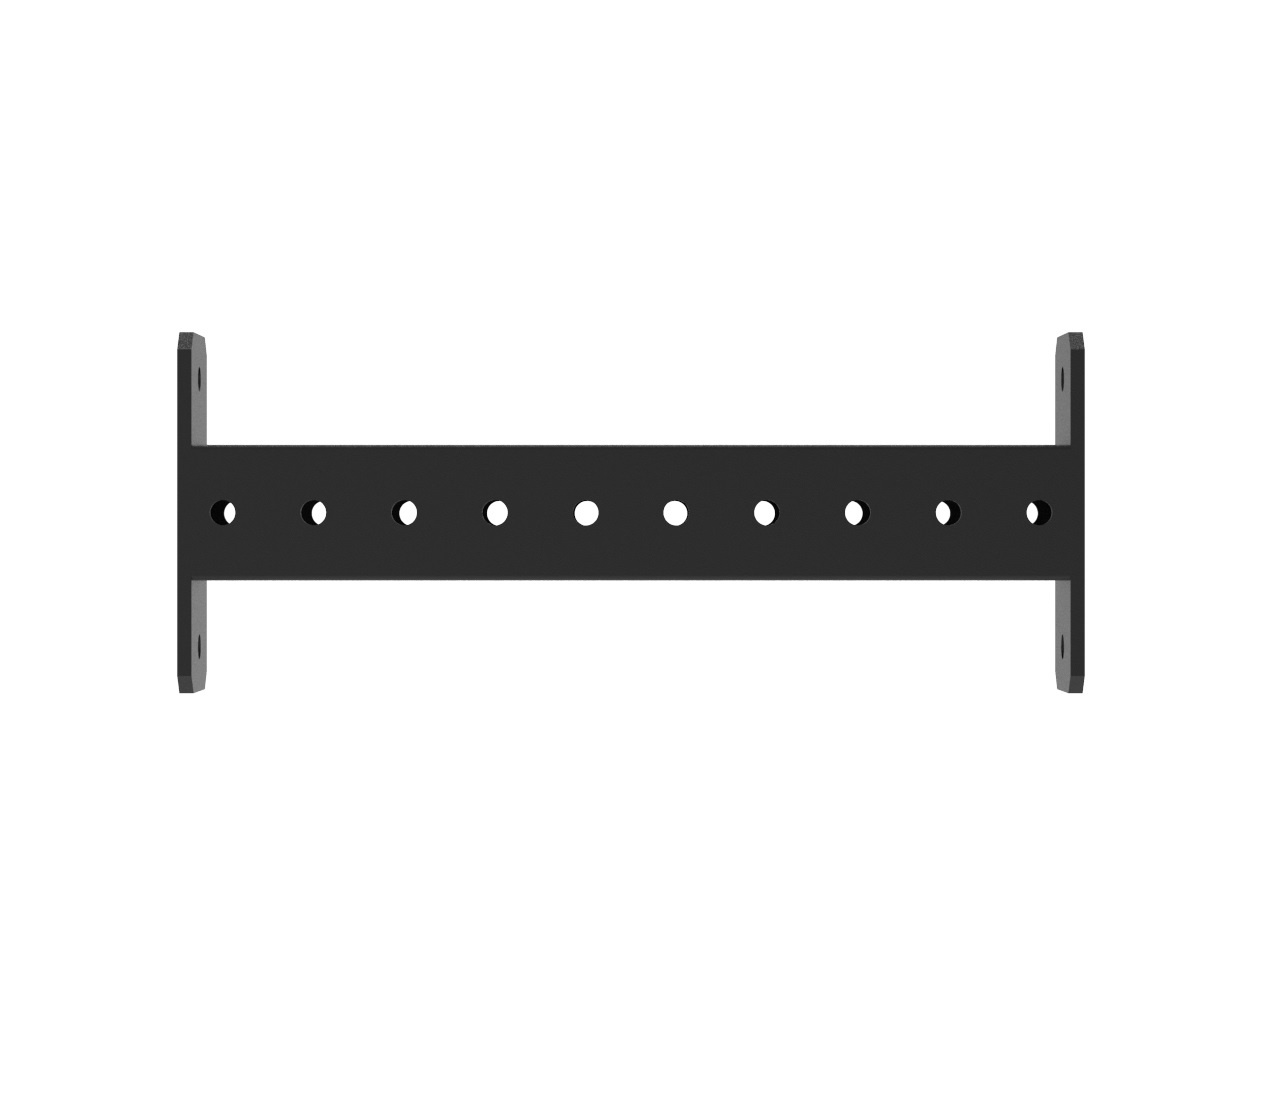 Crossmaxx® LMX1775 Crossmaxx® XL 50cm Crossbar (available May)